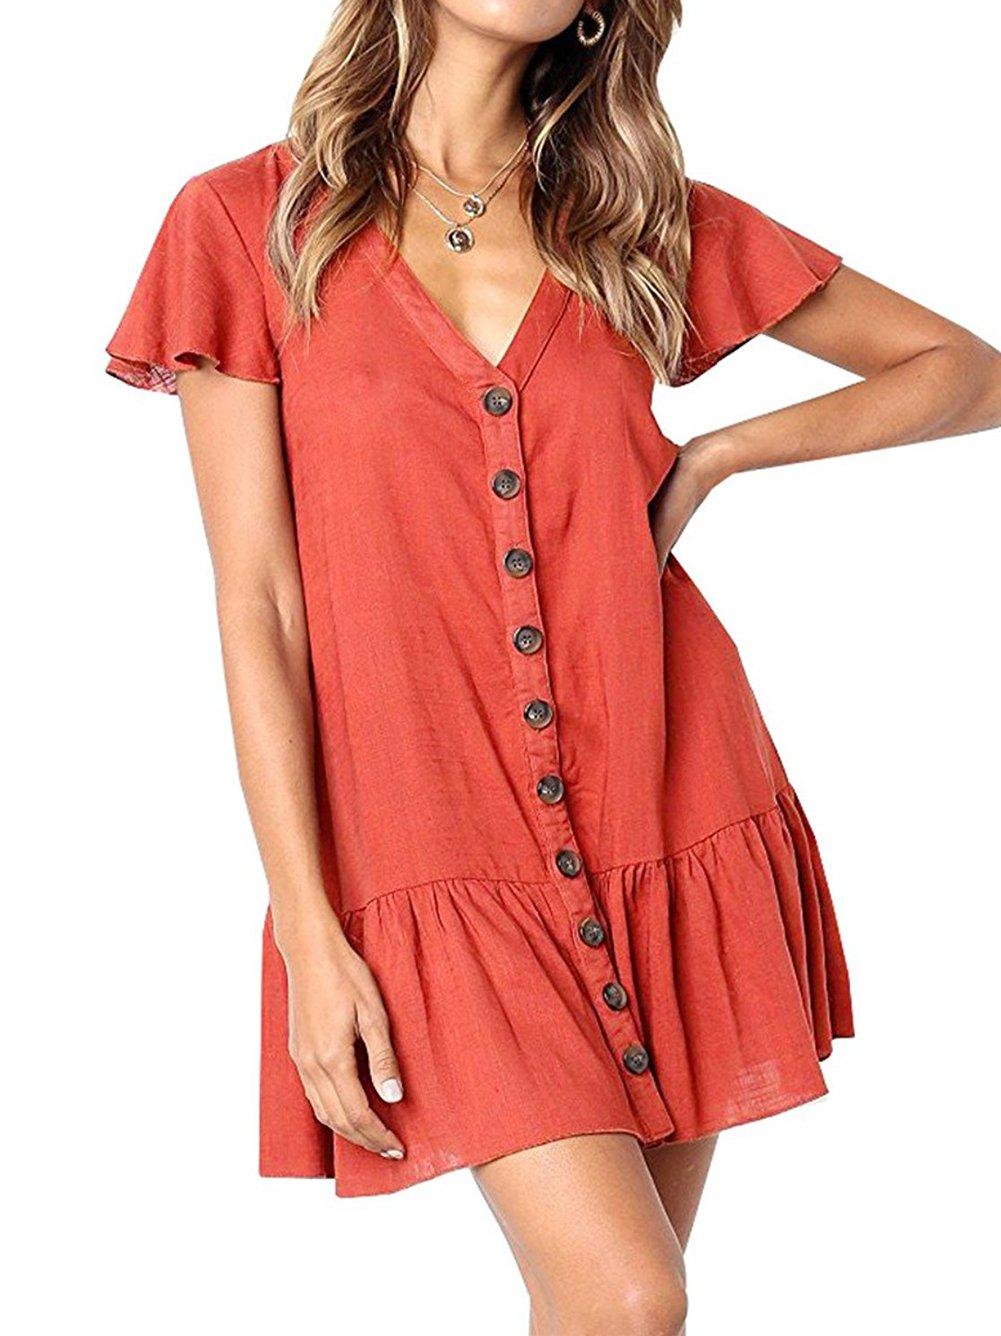 Voopptaw Swing Dress for Girls Summer Cute Short Sleeve Shift Mini Dress Red Large